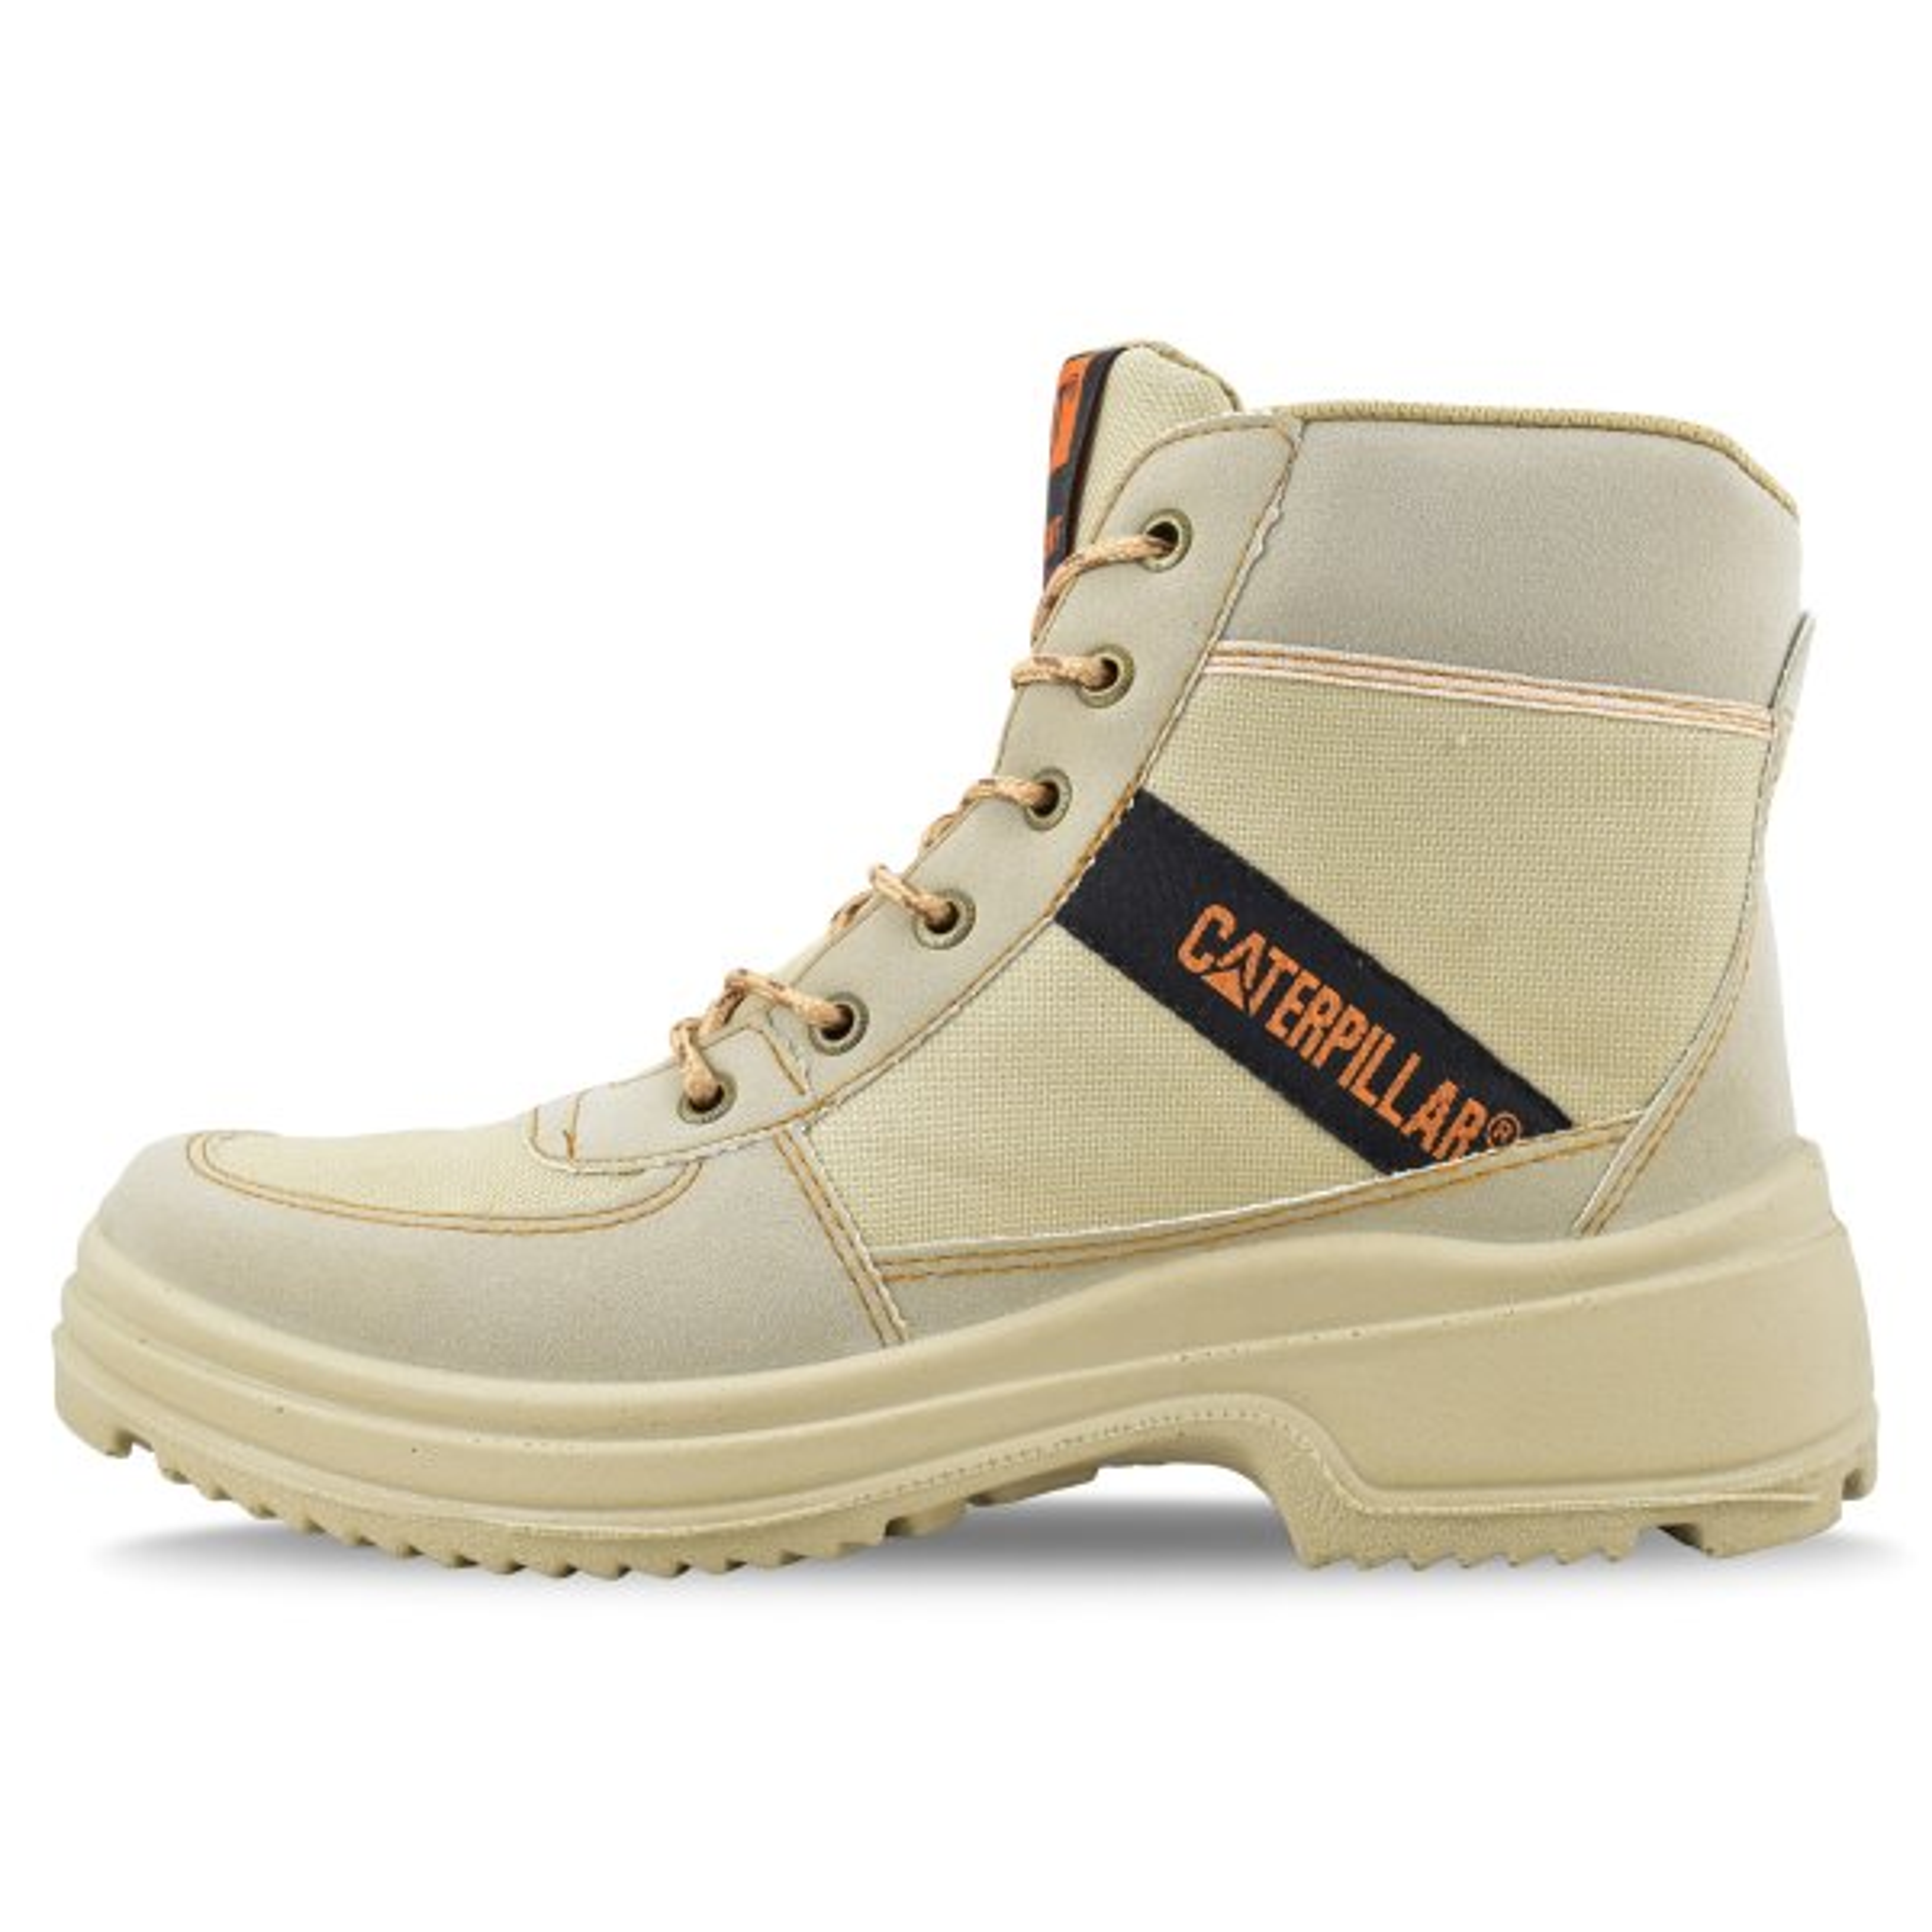 کفش کوهنوردی مردانه سنگام مدل اورست کد 4515